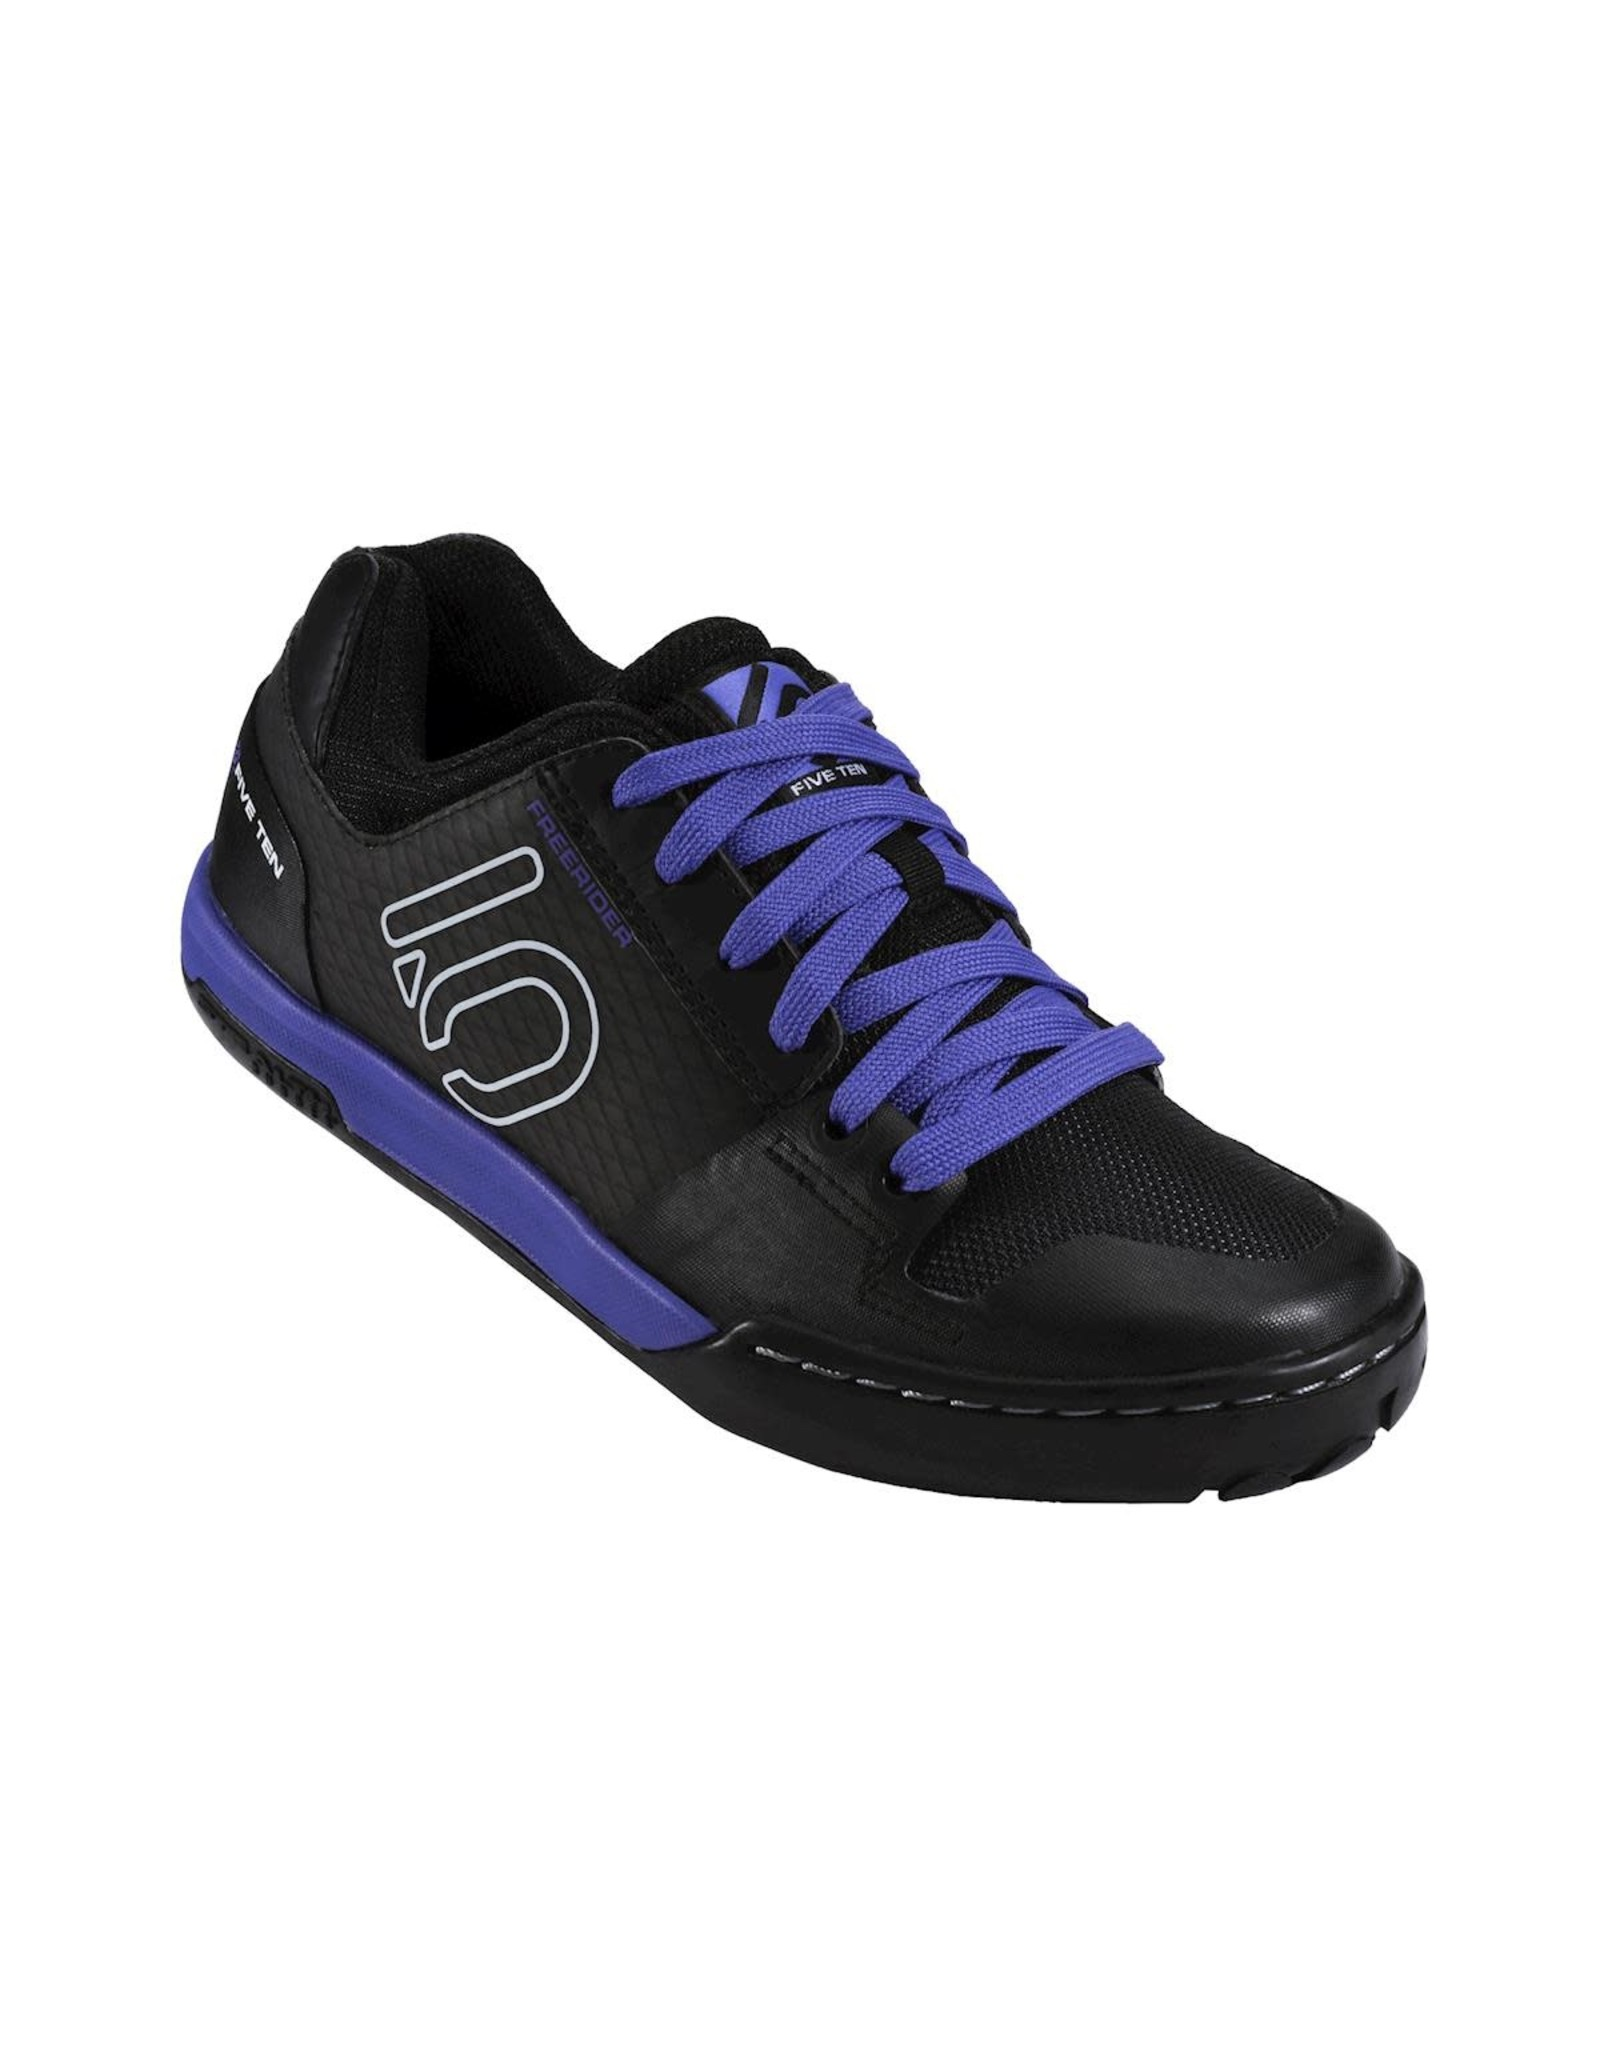 Five Ten Five Ten Freerider Contact Women's Flat Pedal Shoe: Split Purple